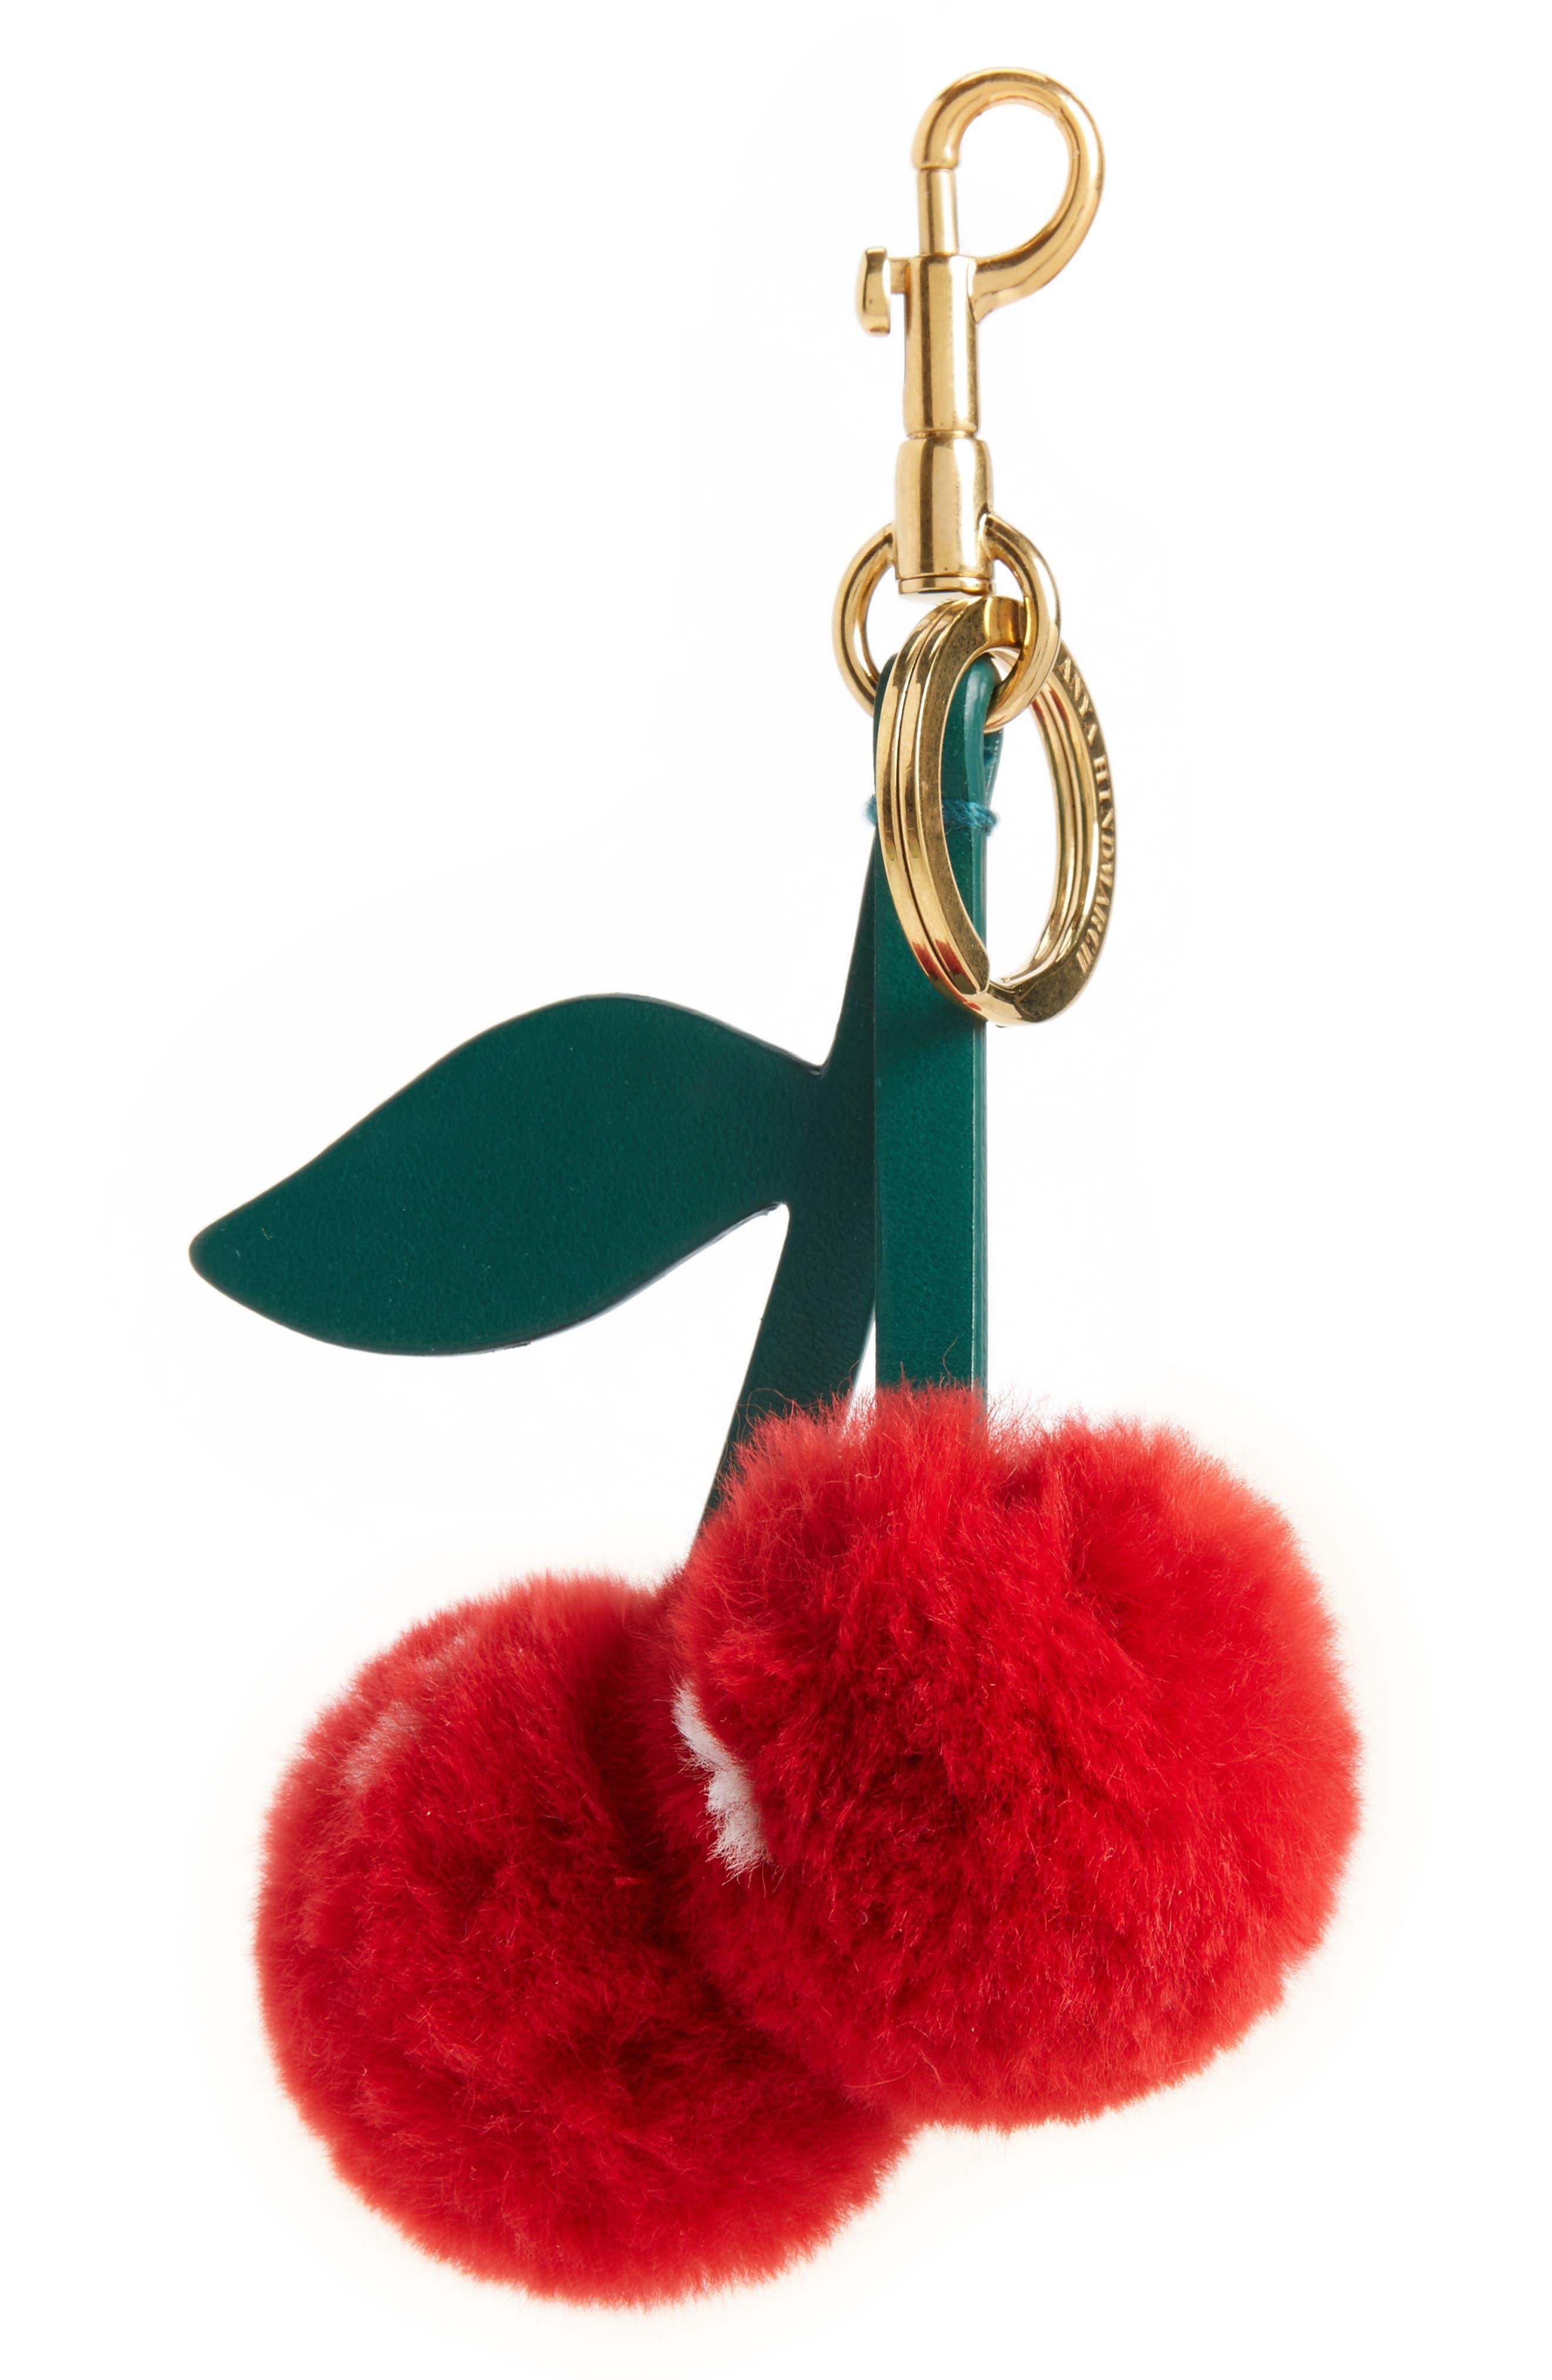 Anya Hindmarch Cherry Genuine Rabbit Fur Bag Charm